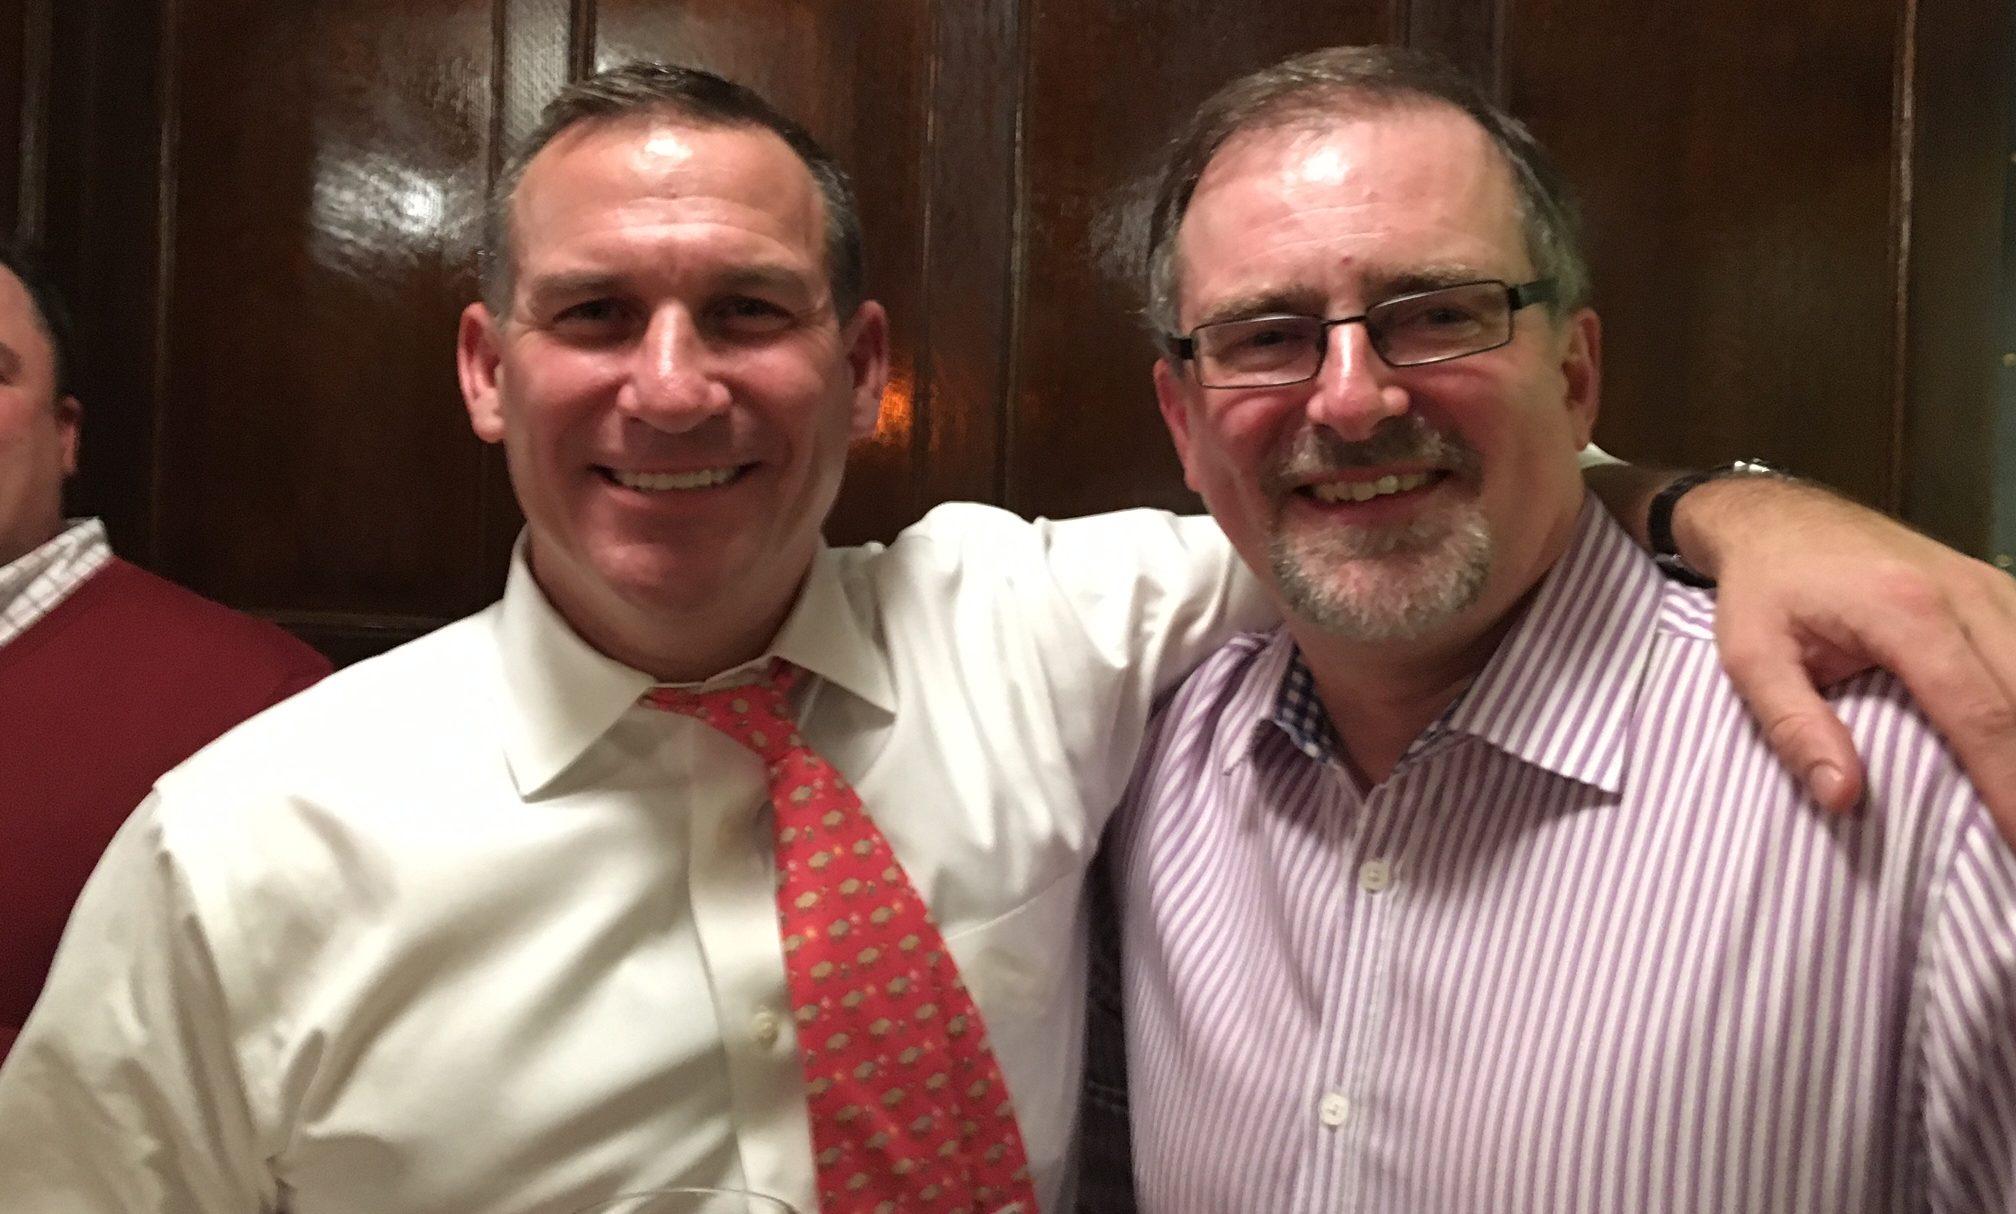 Buffalo native Michael Meade, left, new CEO of Sullivan's Brewing Co. USA, and brew master Ian Hamilton combined with Smithwick family descendants to bring beer from Kilkenny, Ireland, to Buffalo. (Scott Scanlon/Buffalo News)